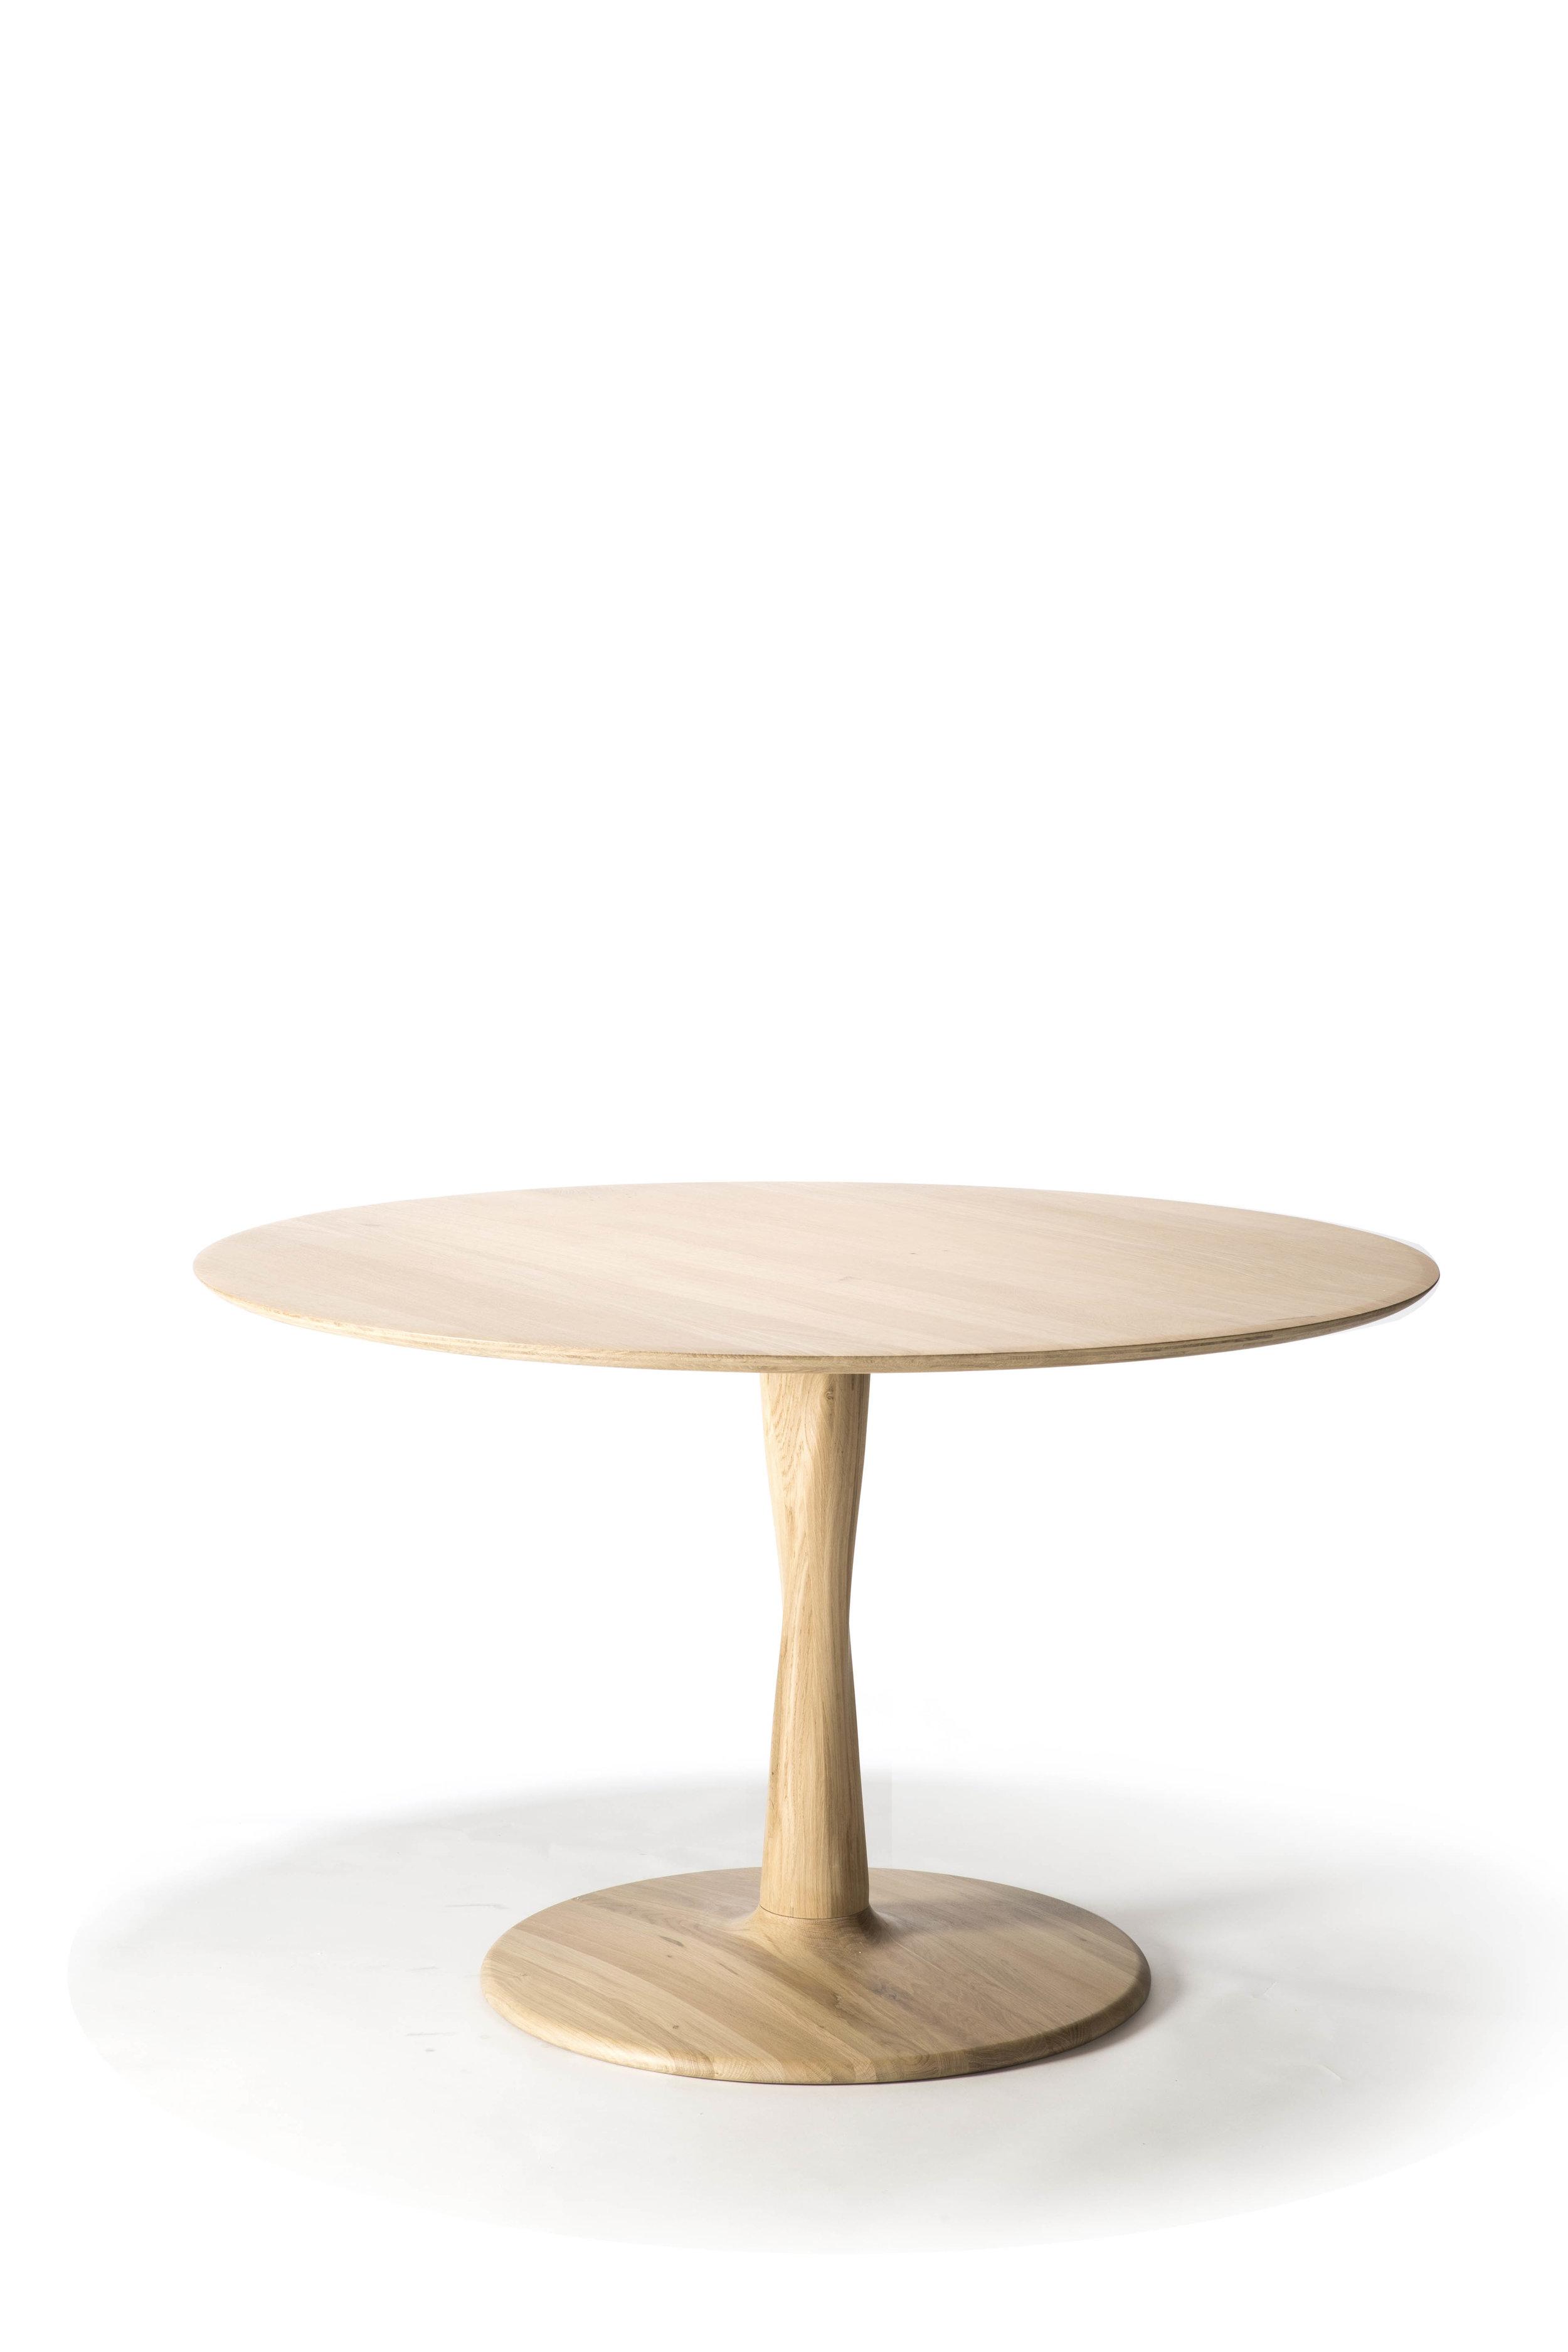 50019 Torsion dining table - Oak.jpg